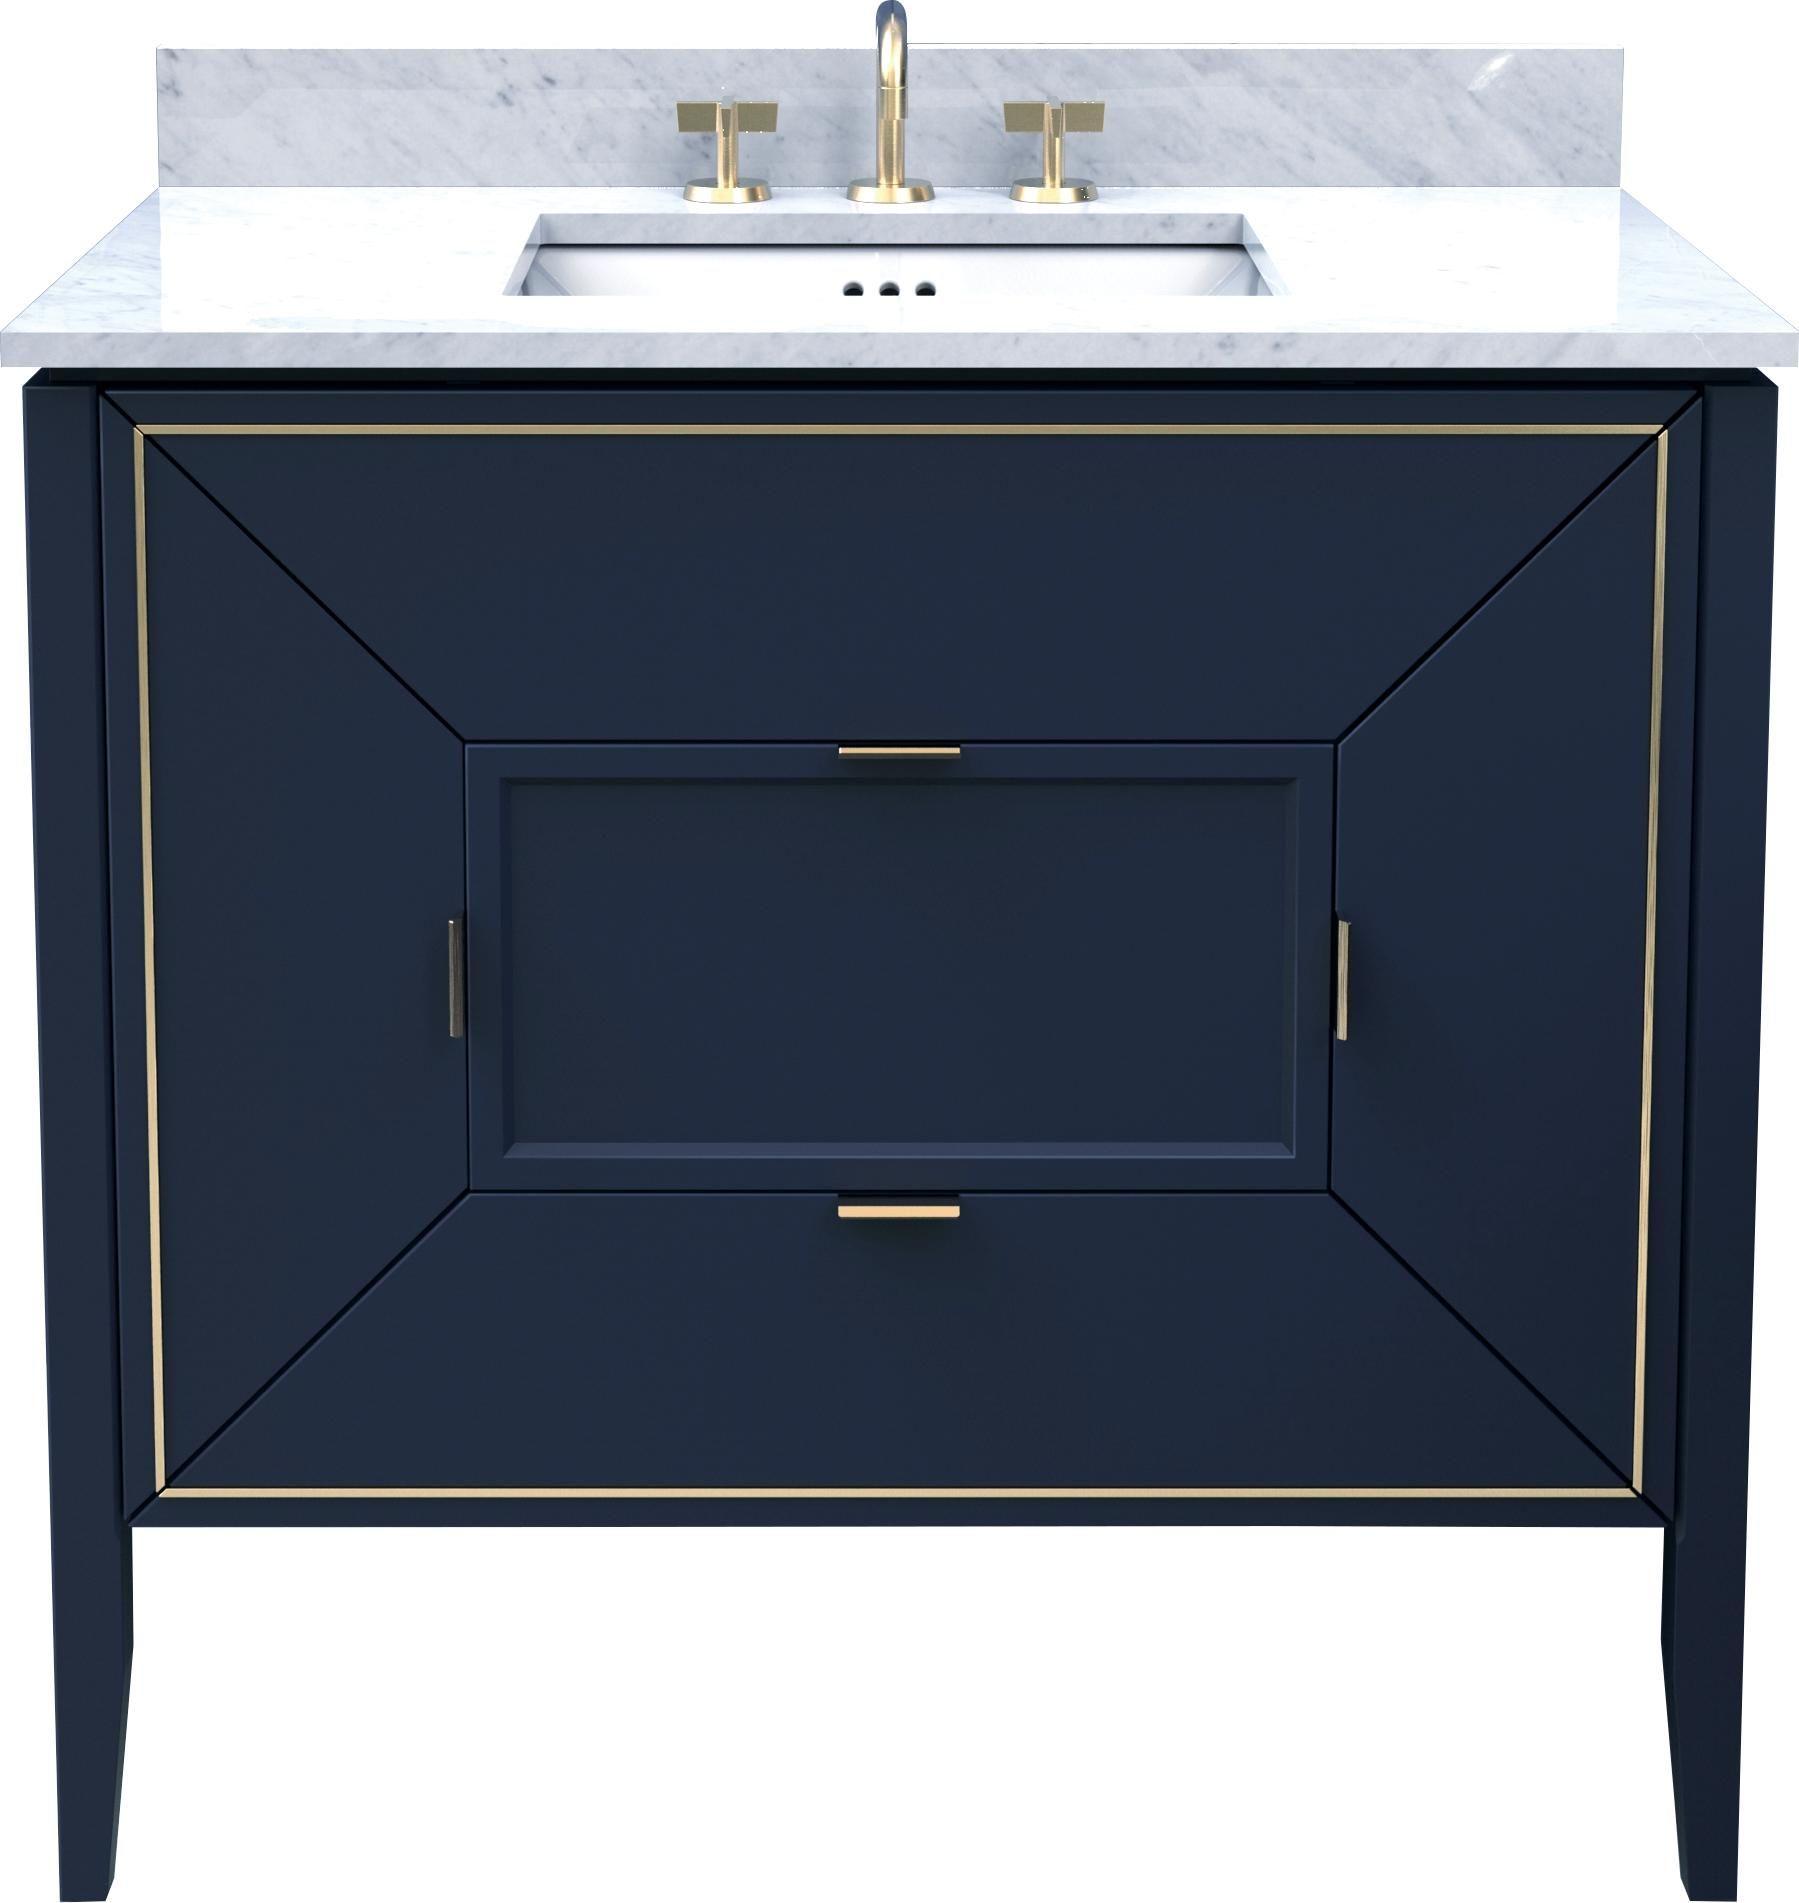 Ronbow 054036 Amora Bathroom Vanity   Bathroom vanities, Vanities ...